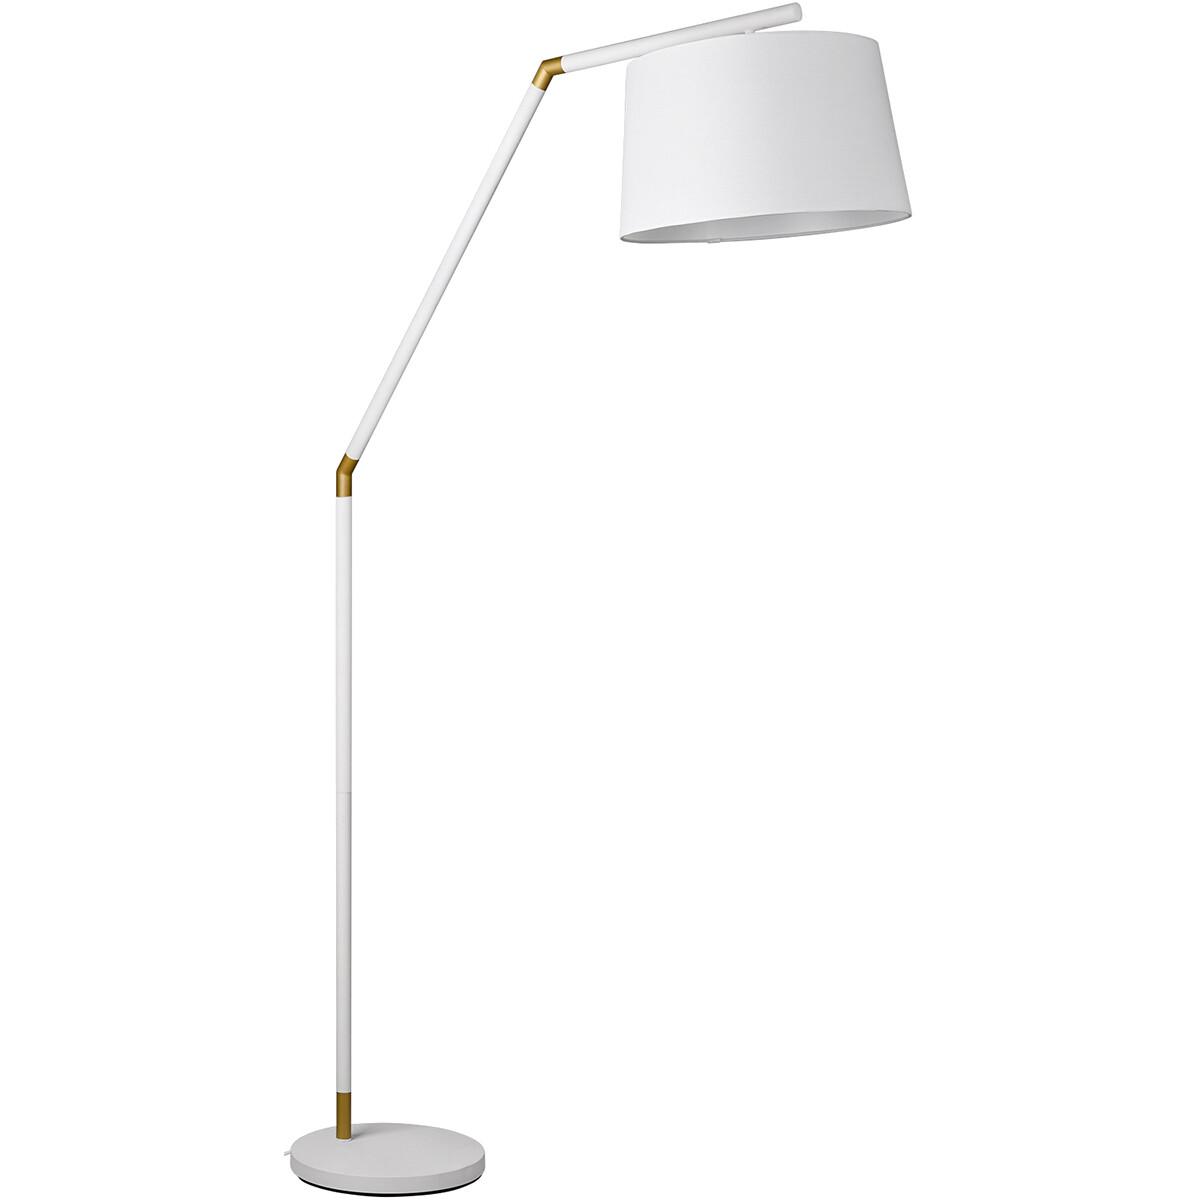 LED Vloerlamp - Trion Tryca - E27 Fitting - Rond - Mat Wit - Aluminium